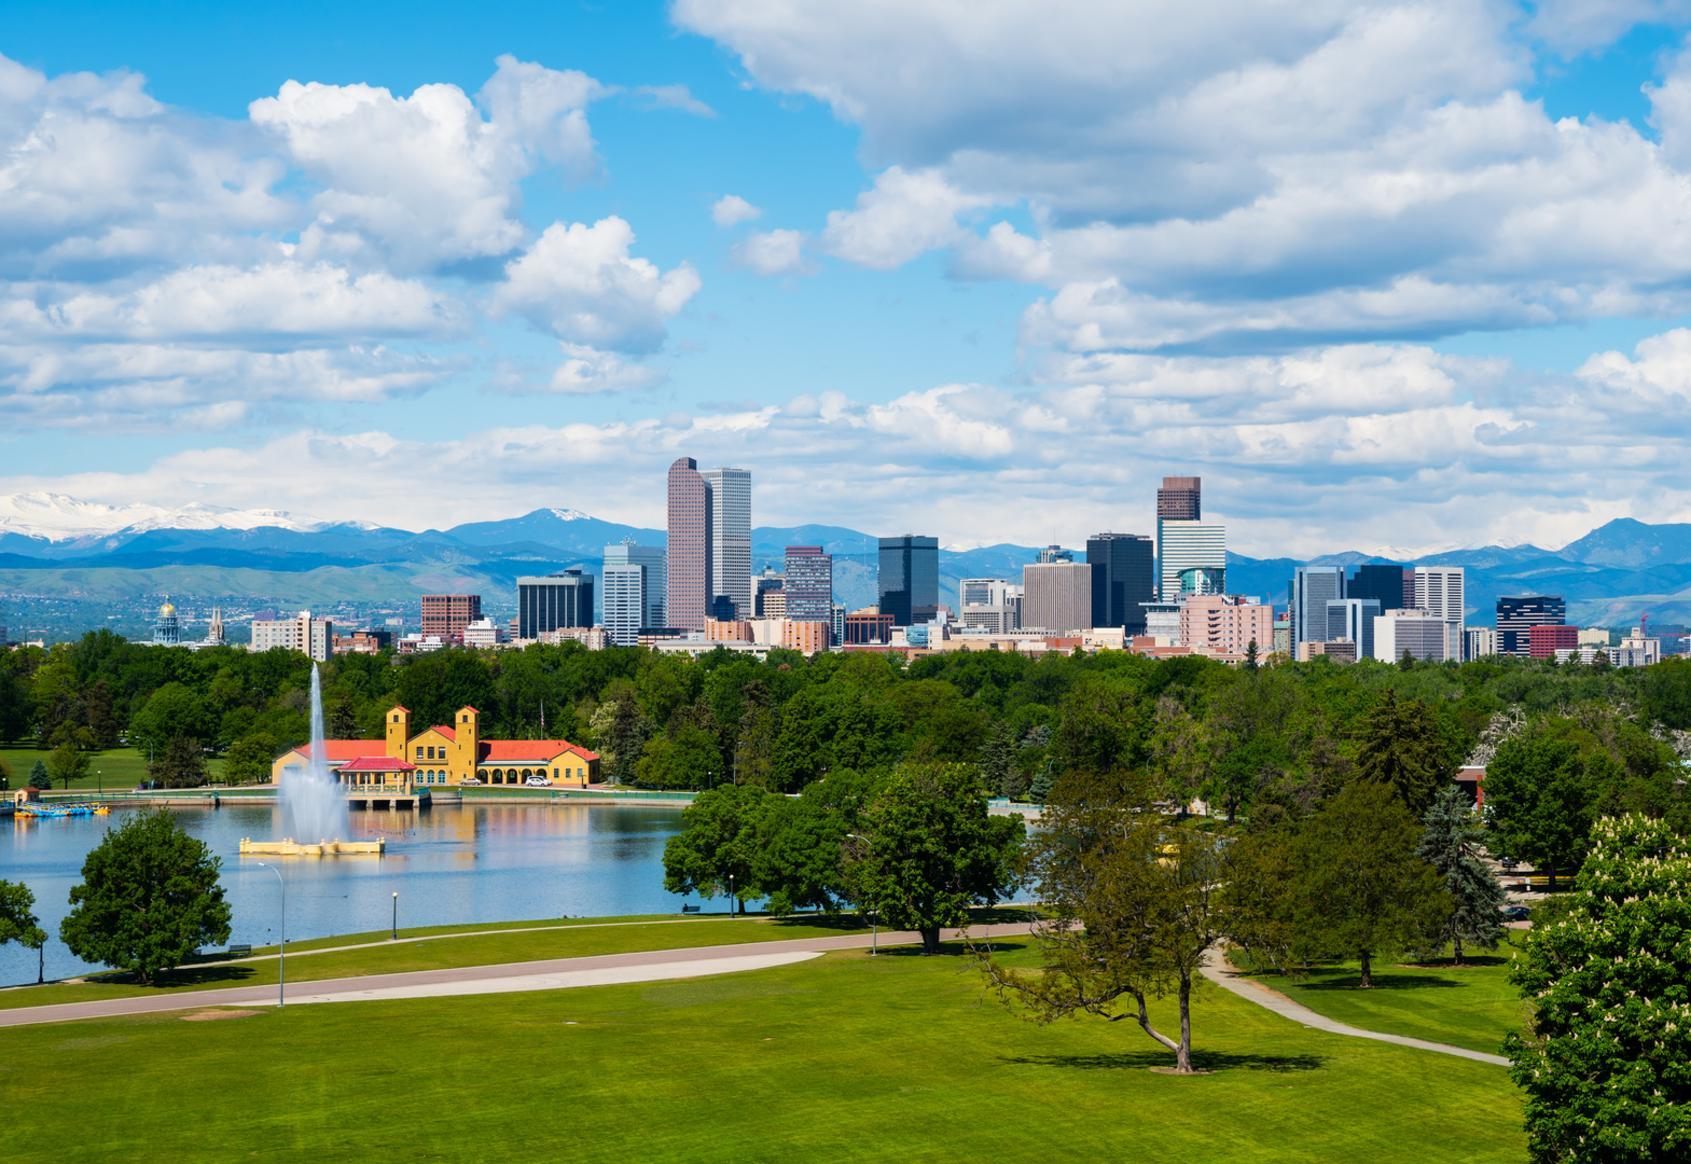 Denver - Best Hotels and Restaurants